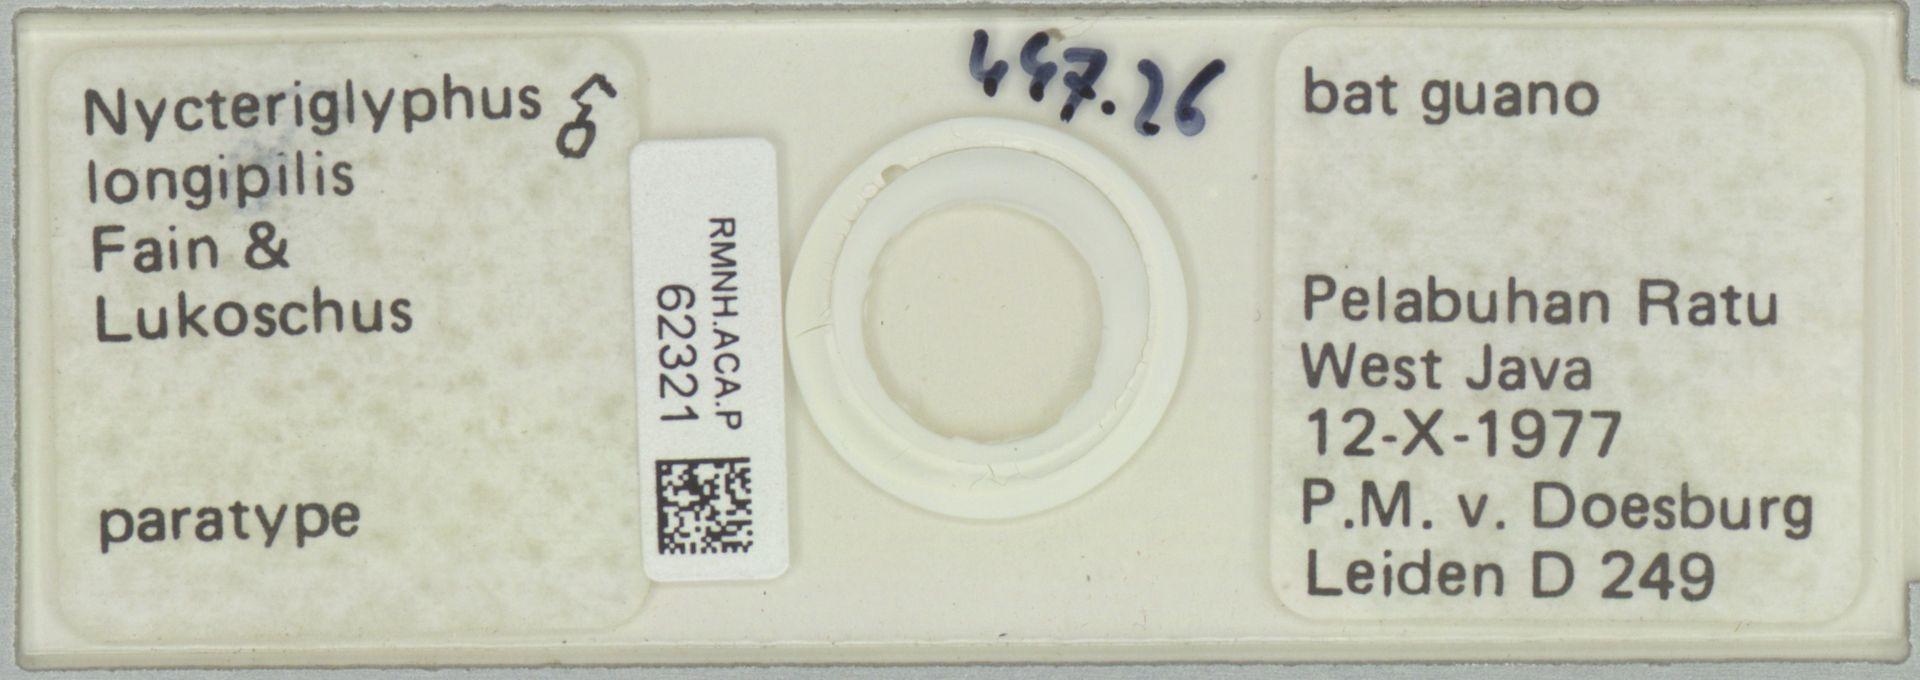 RMNH.ACA.P.62321 | Nycteriglyphus longipilis Fain & Lukoschus